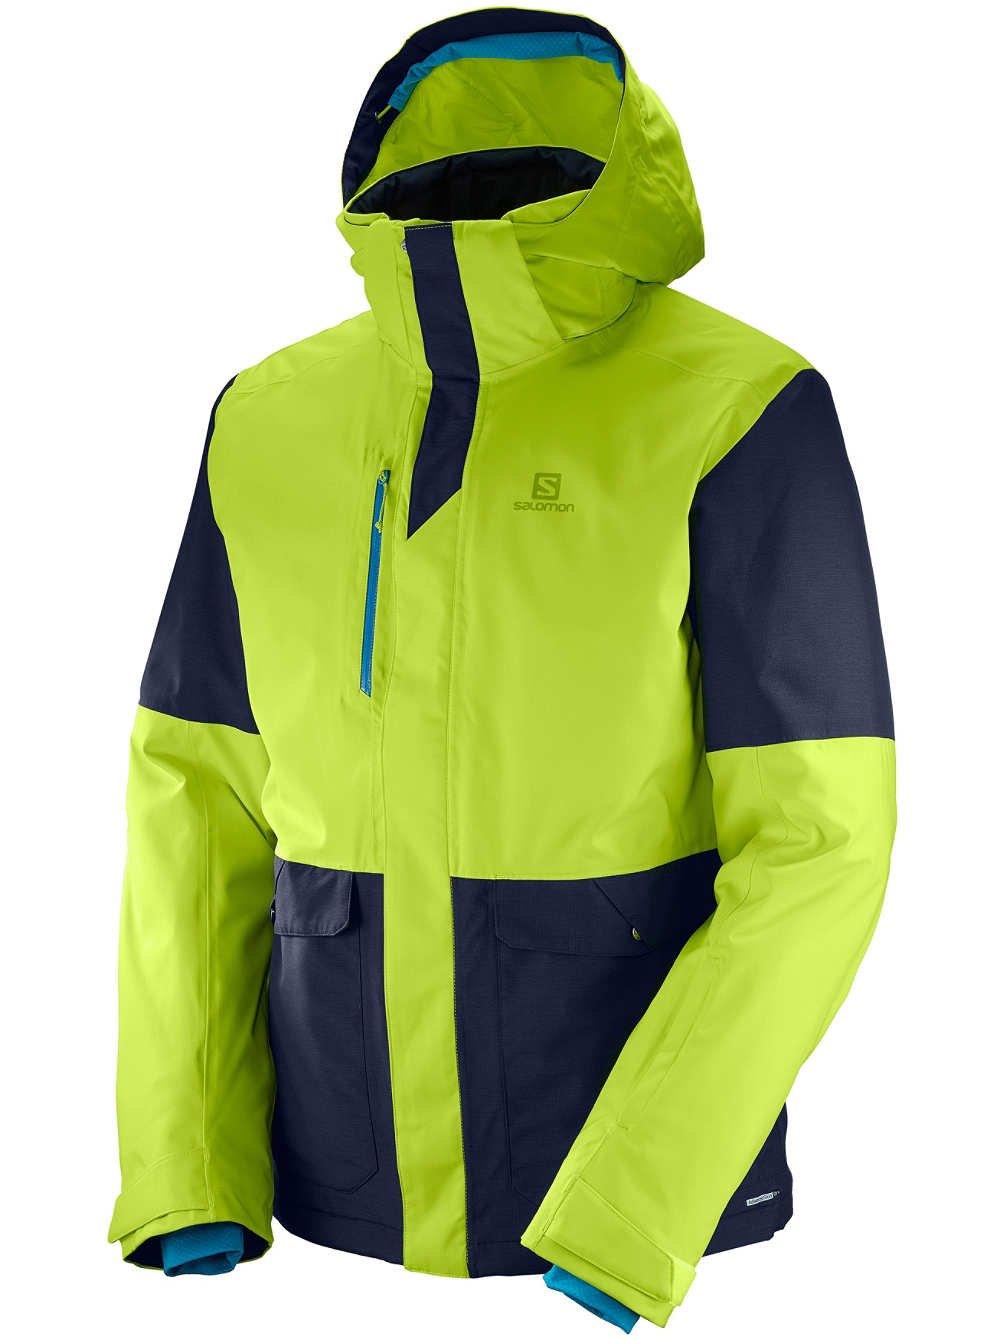 SALOMON(サロモン)STORMTRACK JKT M メンズ スキーウェア レギュラーフィット L39766000 AcidLim L B01MYAPY4S